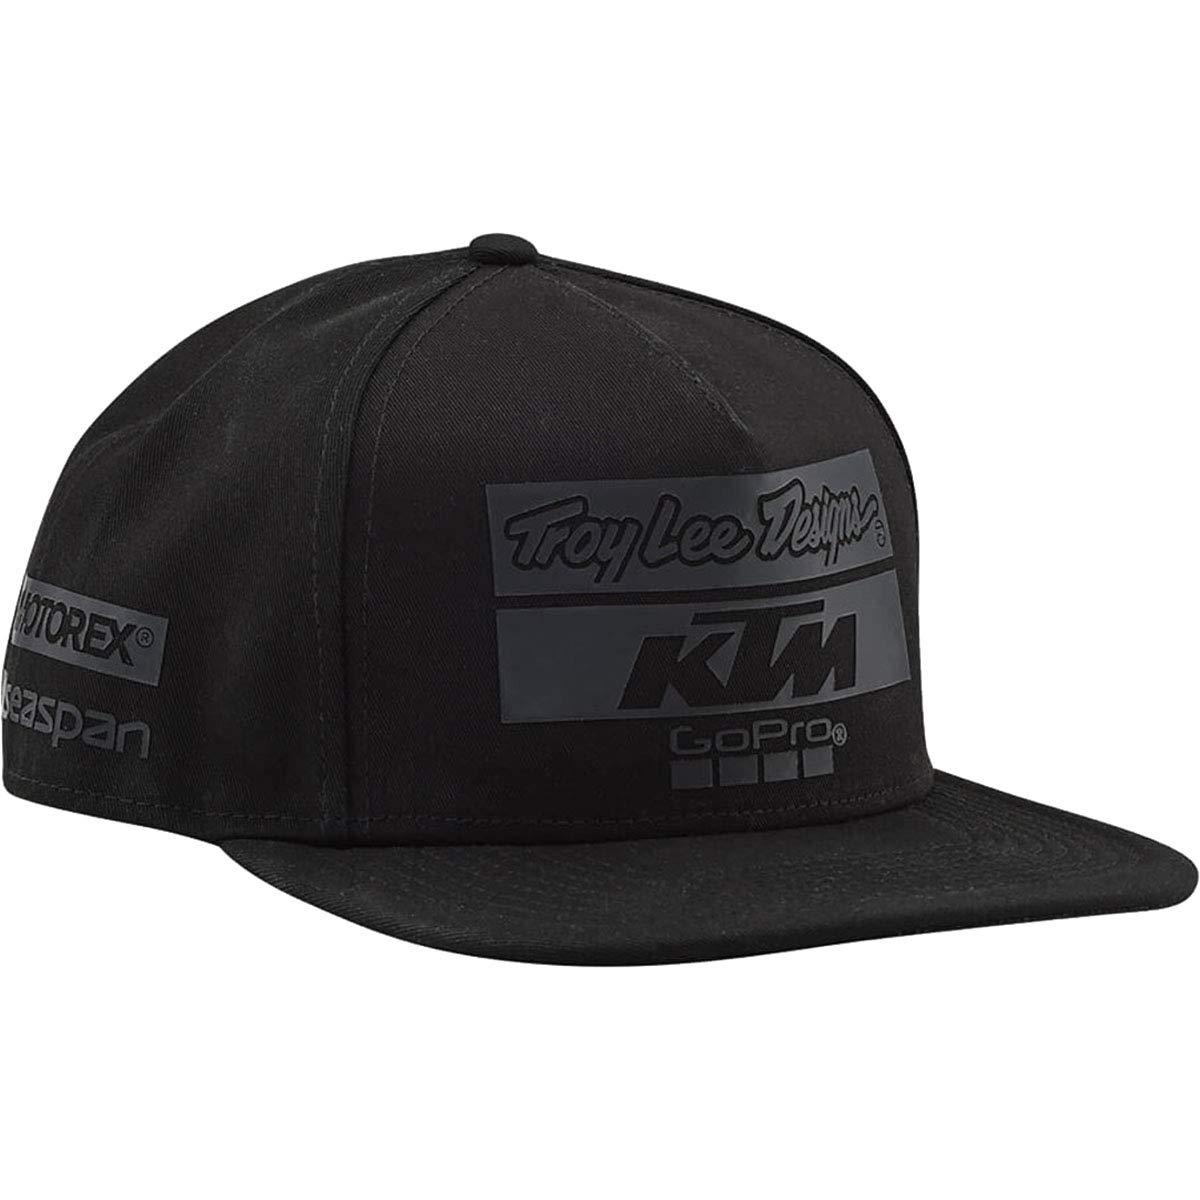 Troy Lee Designs KTM Team Limited Edition Blackout New Era 9Fifty Strapback Hat OSFA by Troy Lee Designs